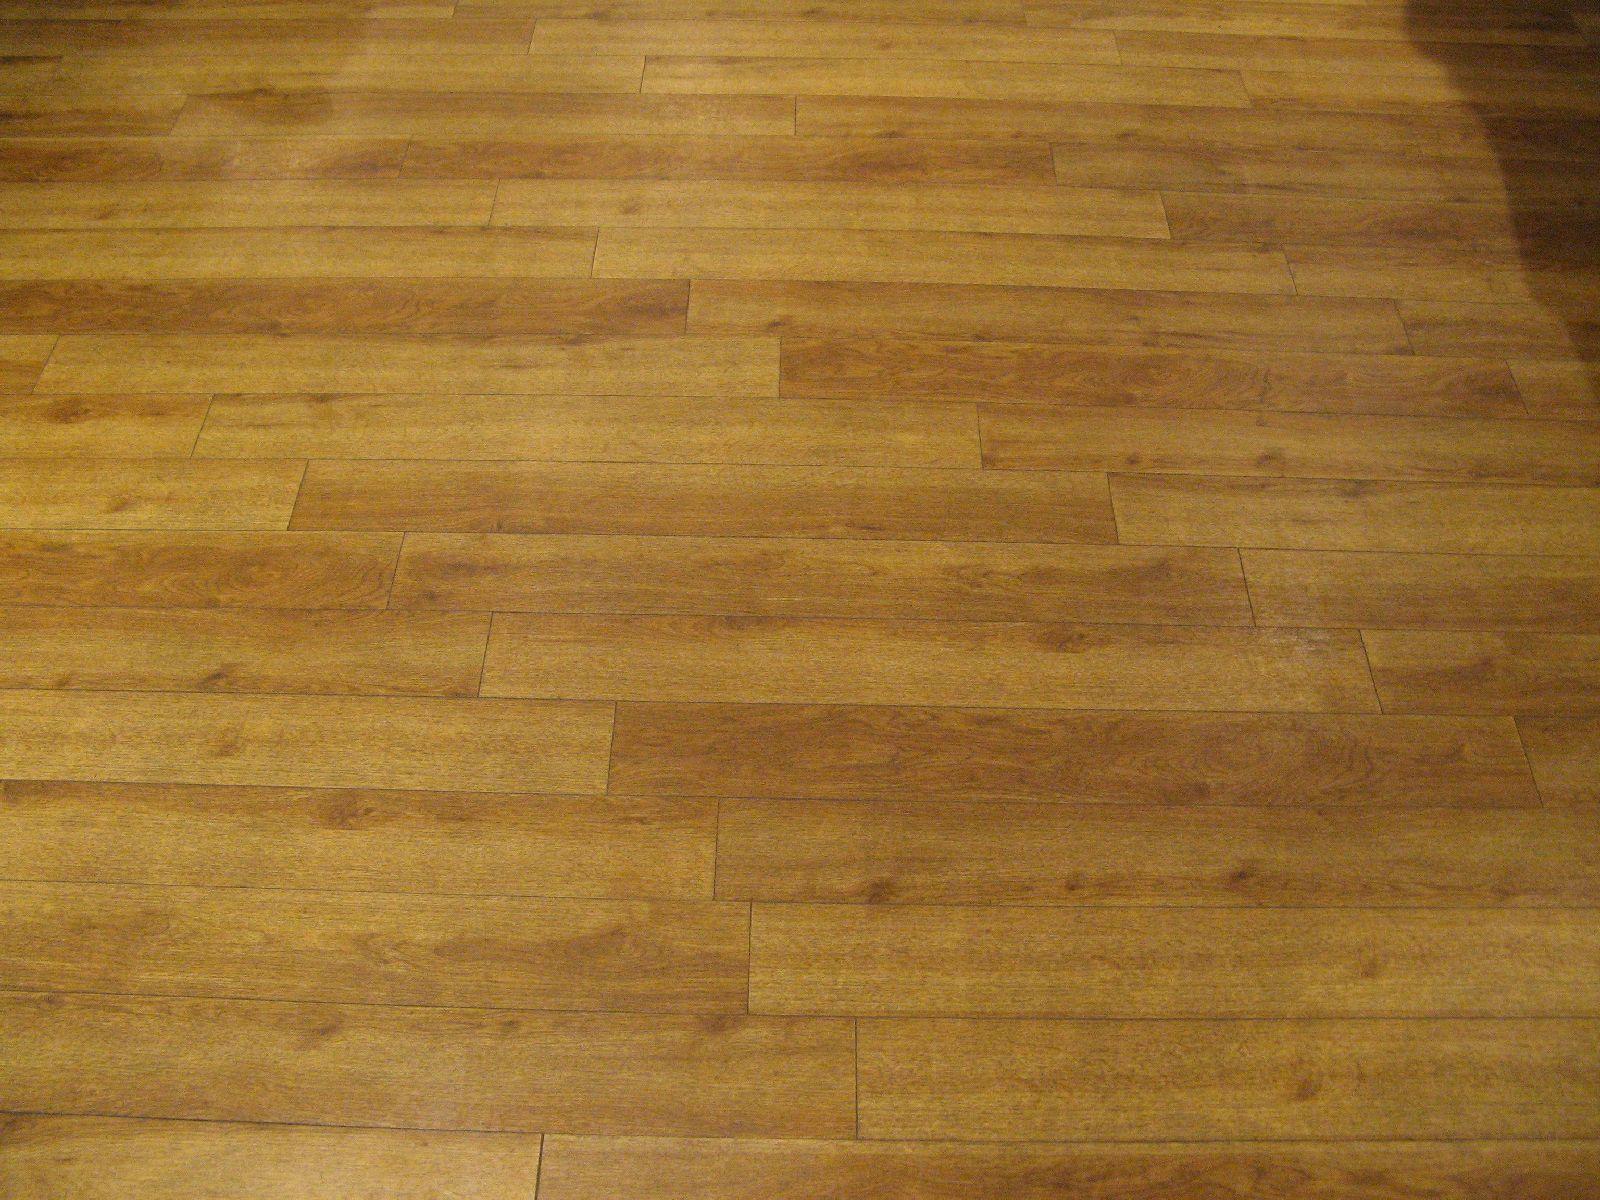 Wood_Textures_B_3587